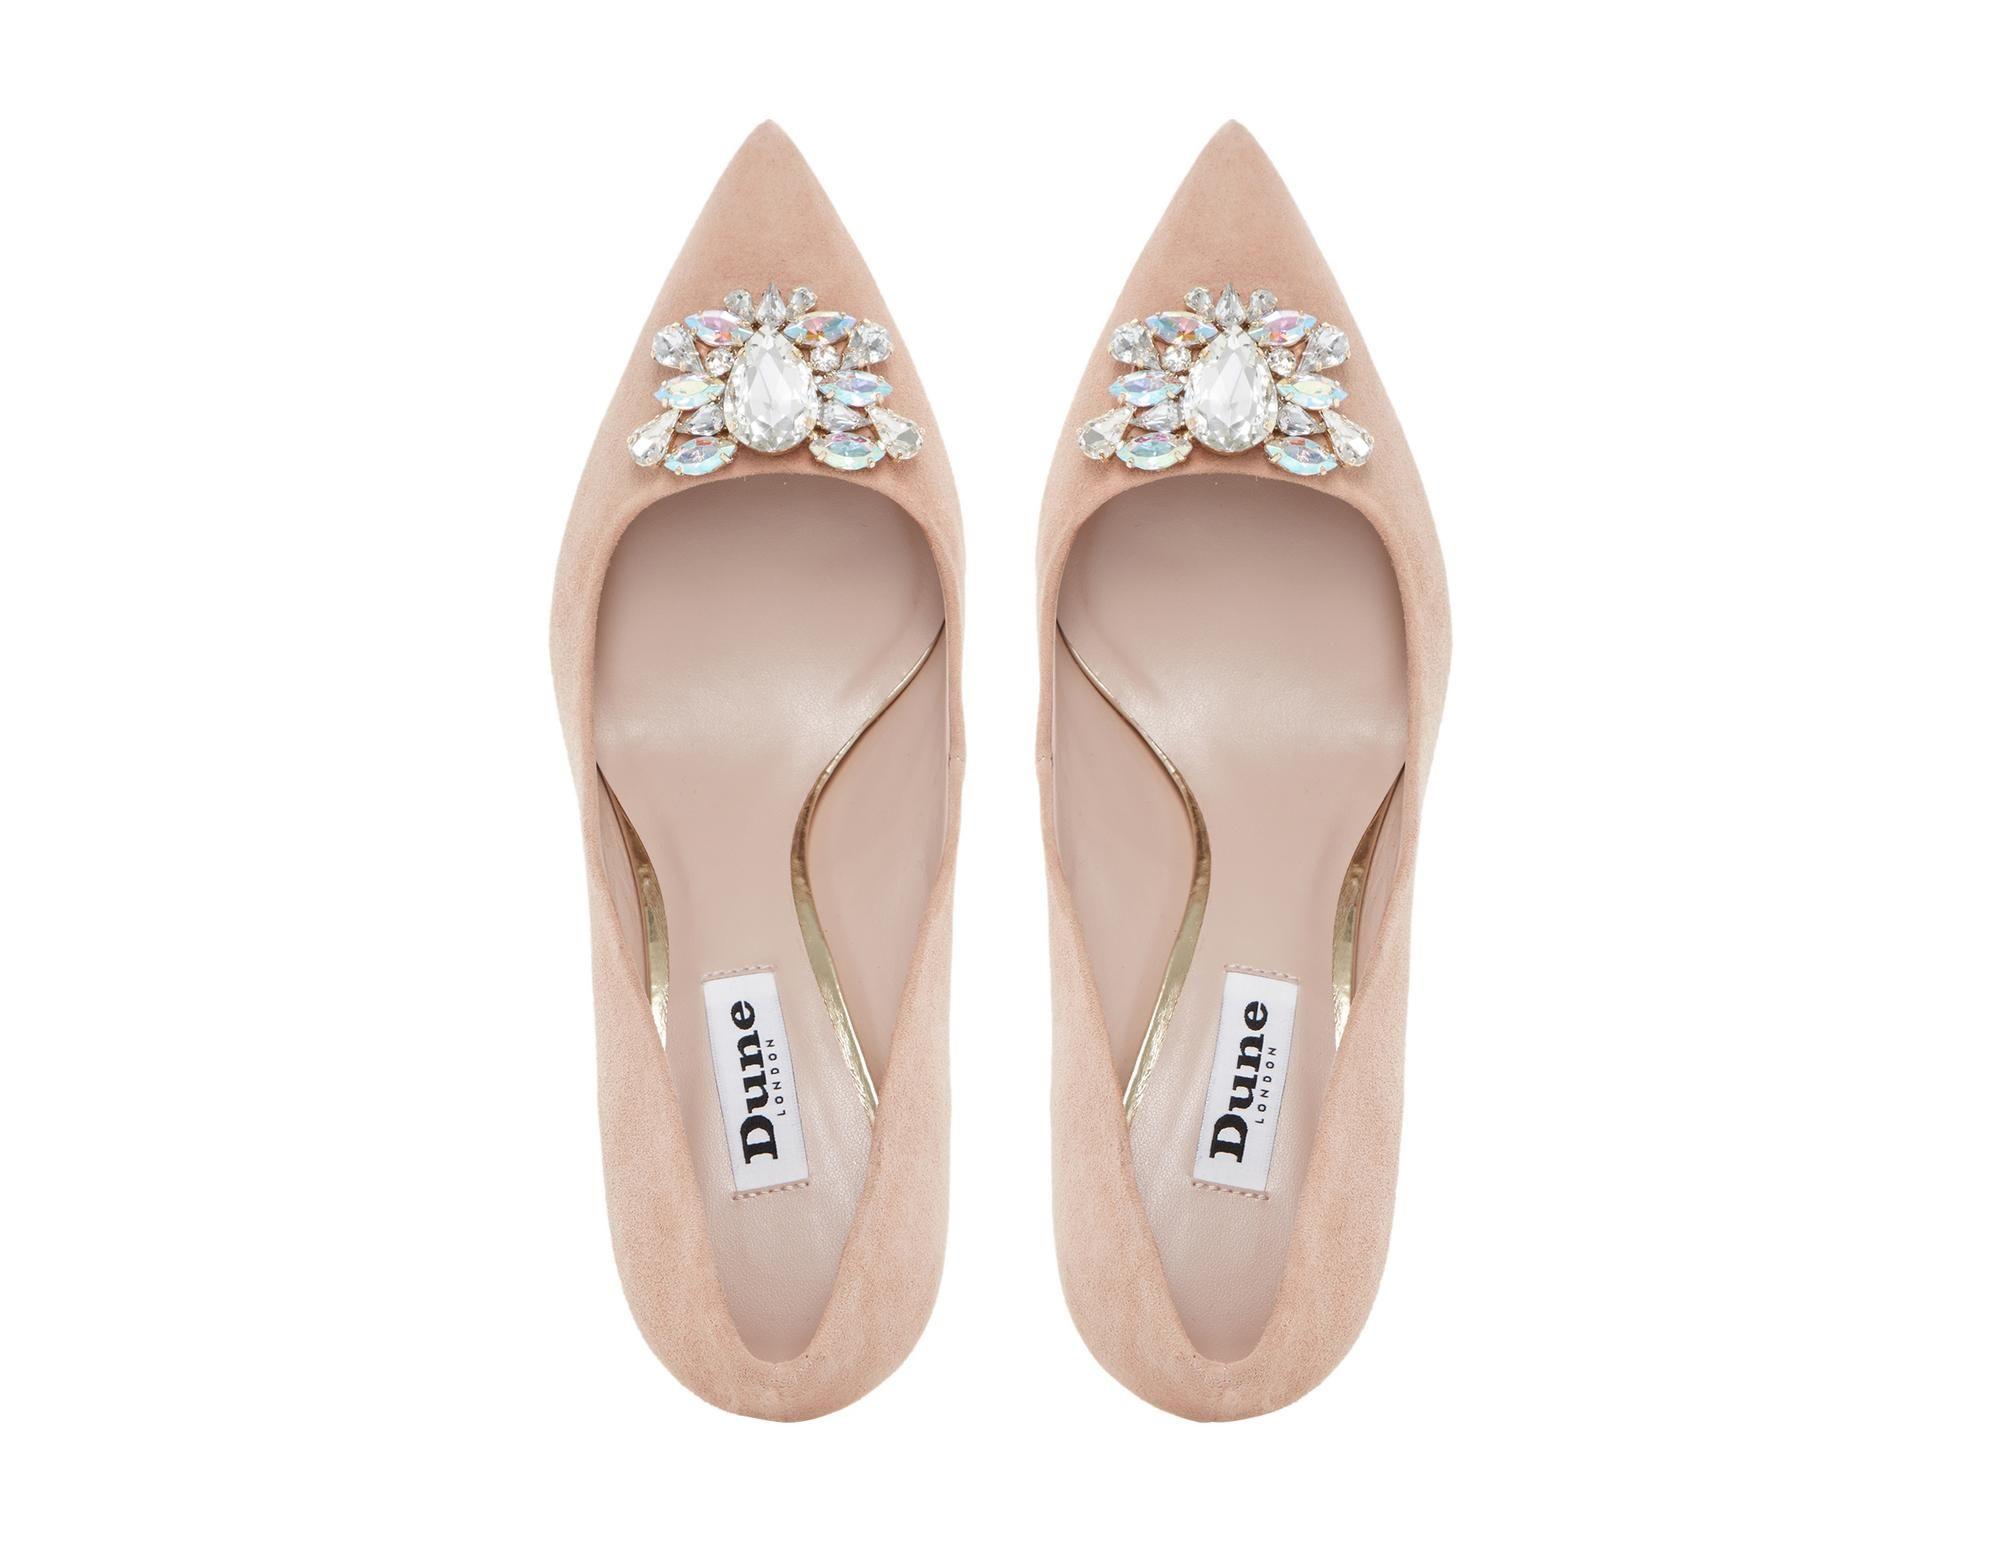 b2b1083f959 DUNE LADIES BELLES - Jewel Trim Mid Heel Pointed Toe Pump - blush ...